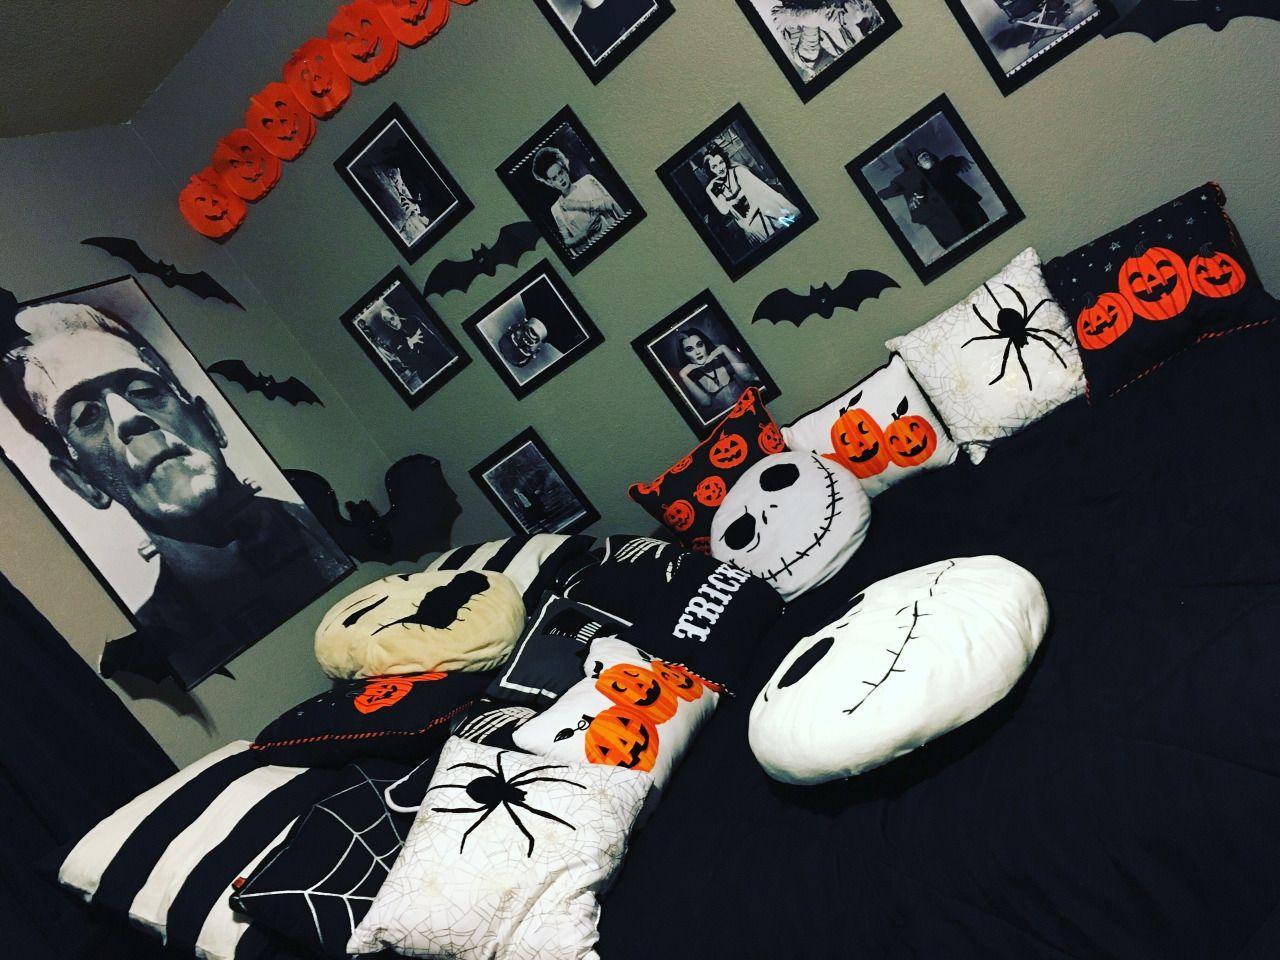 autumn thrills and halloween chills - Emo Bedroom Designs